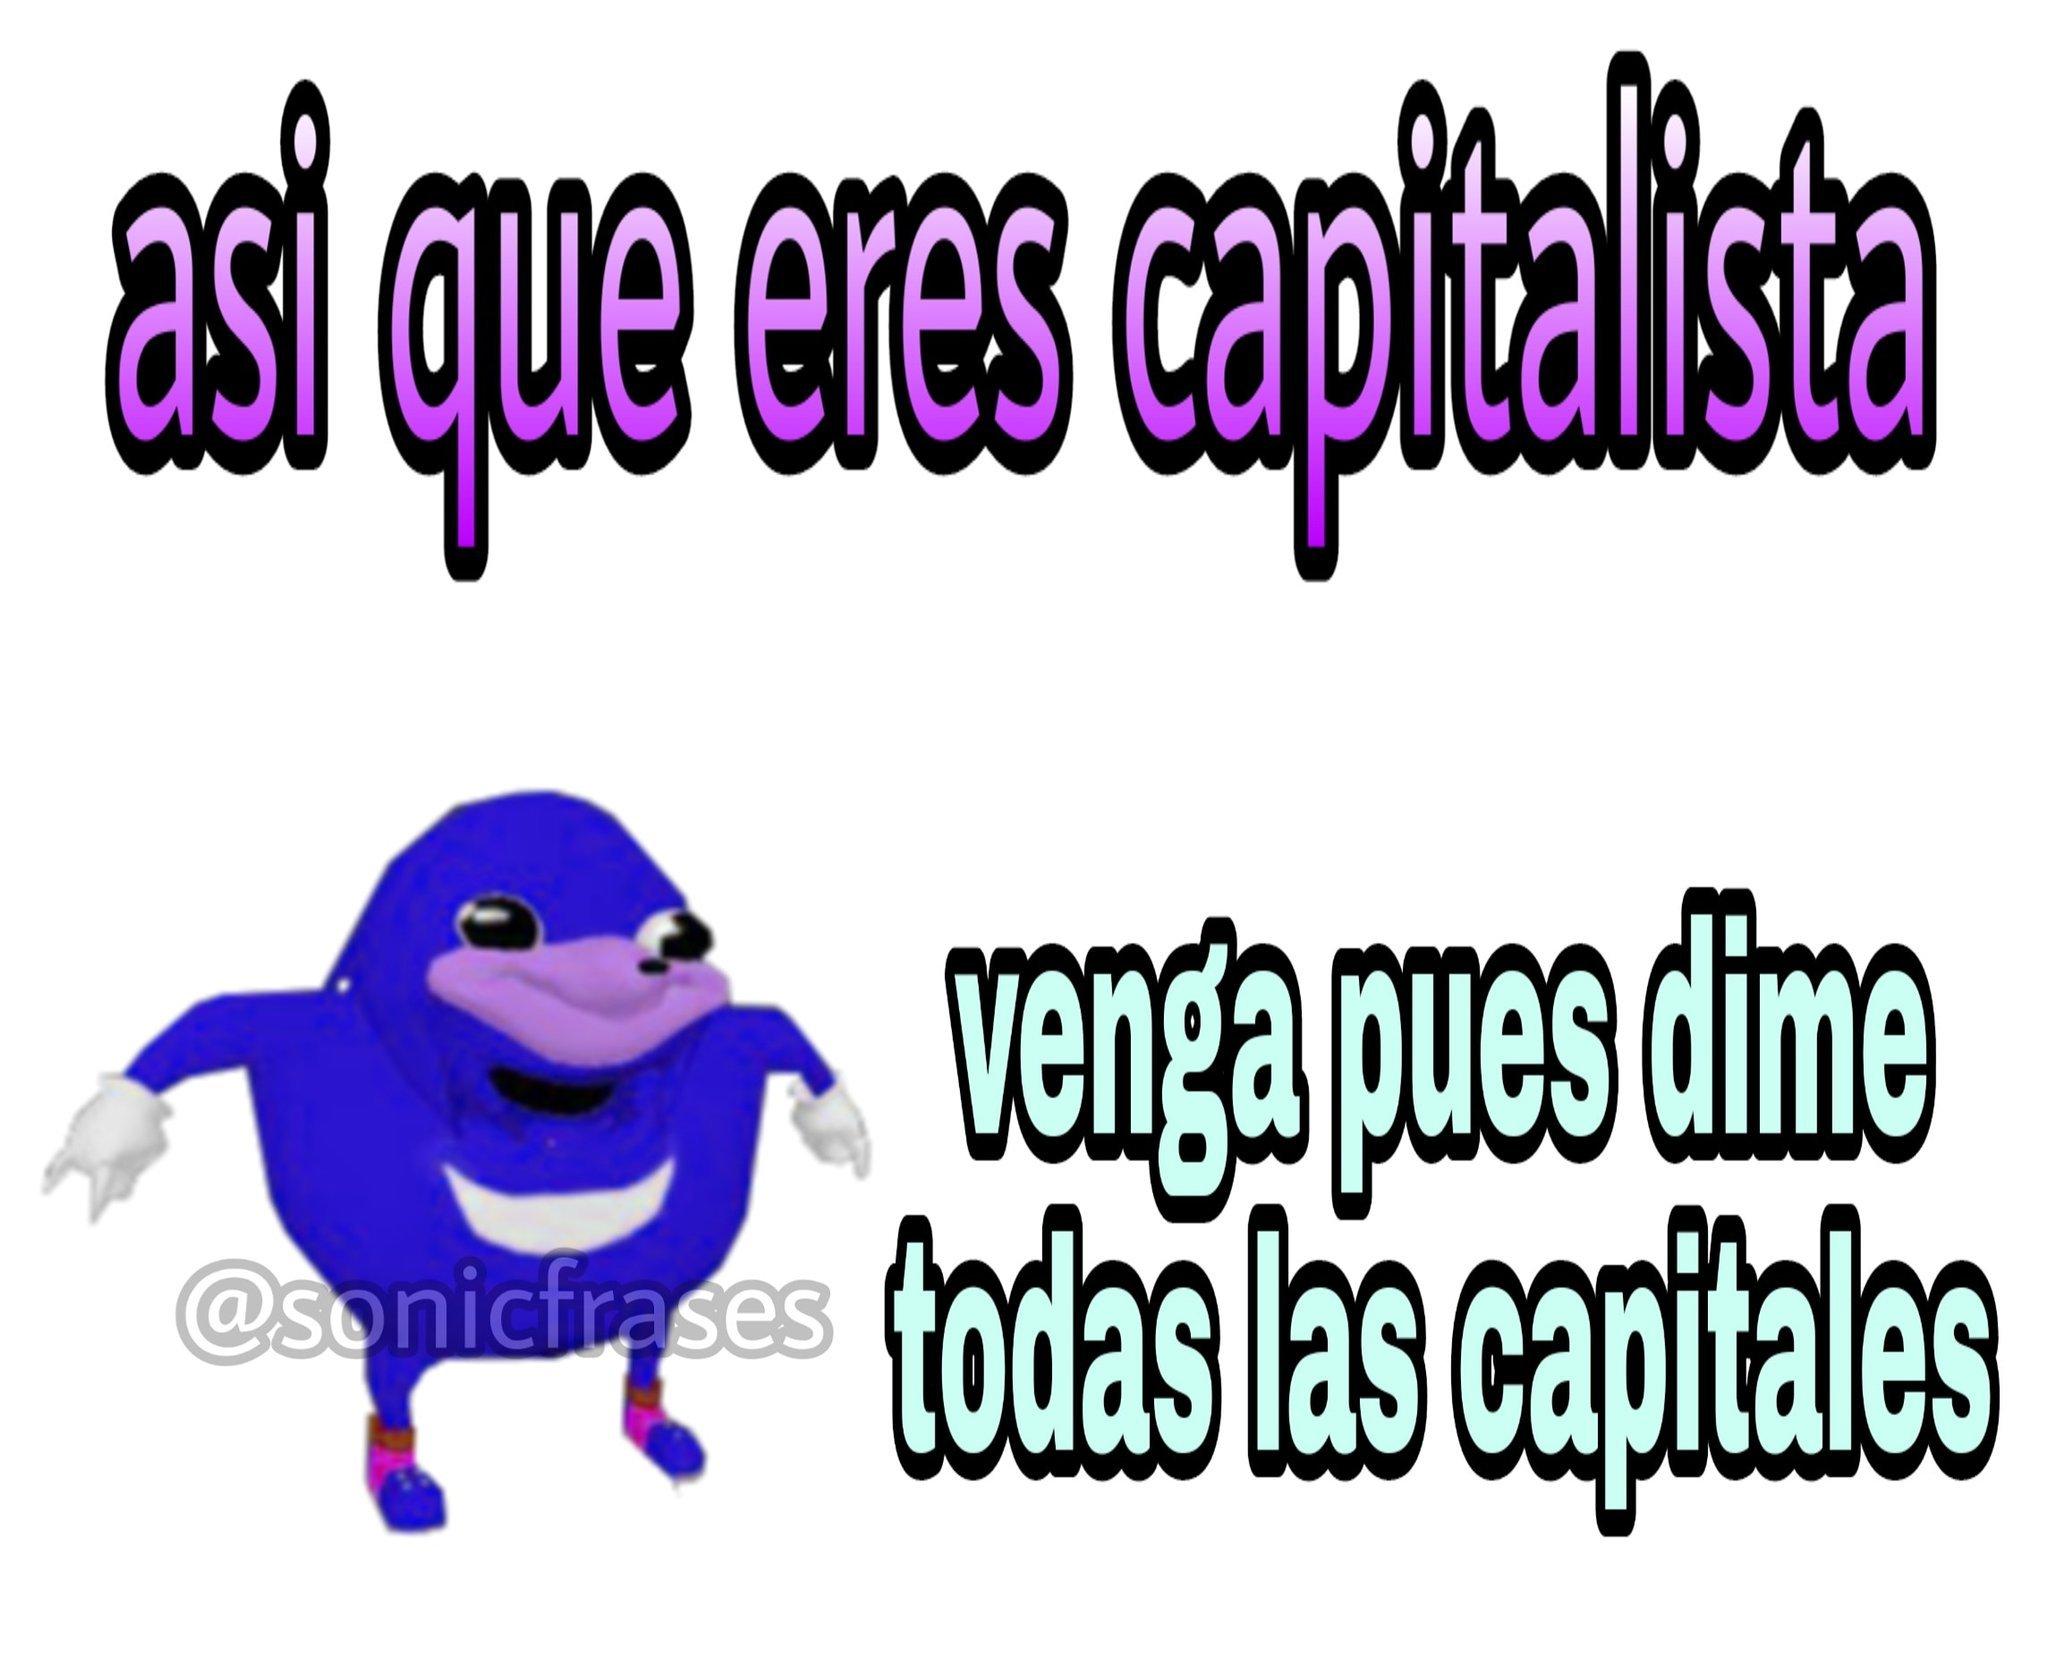 asi que eres capitalista? - meme